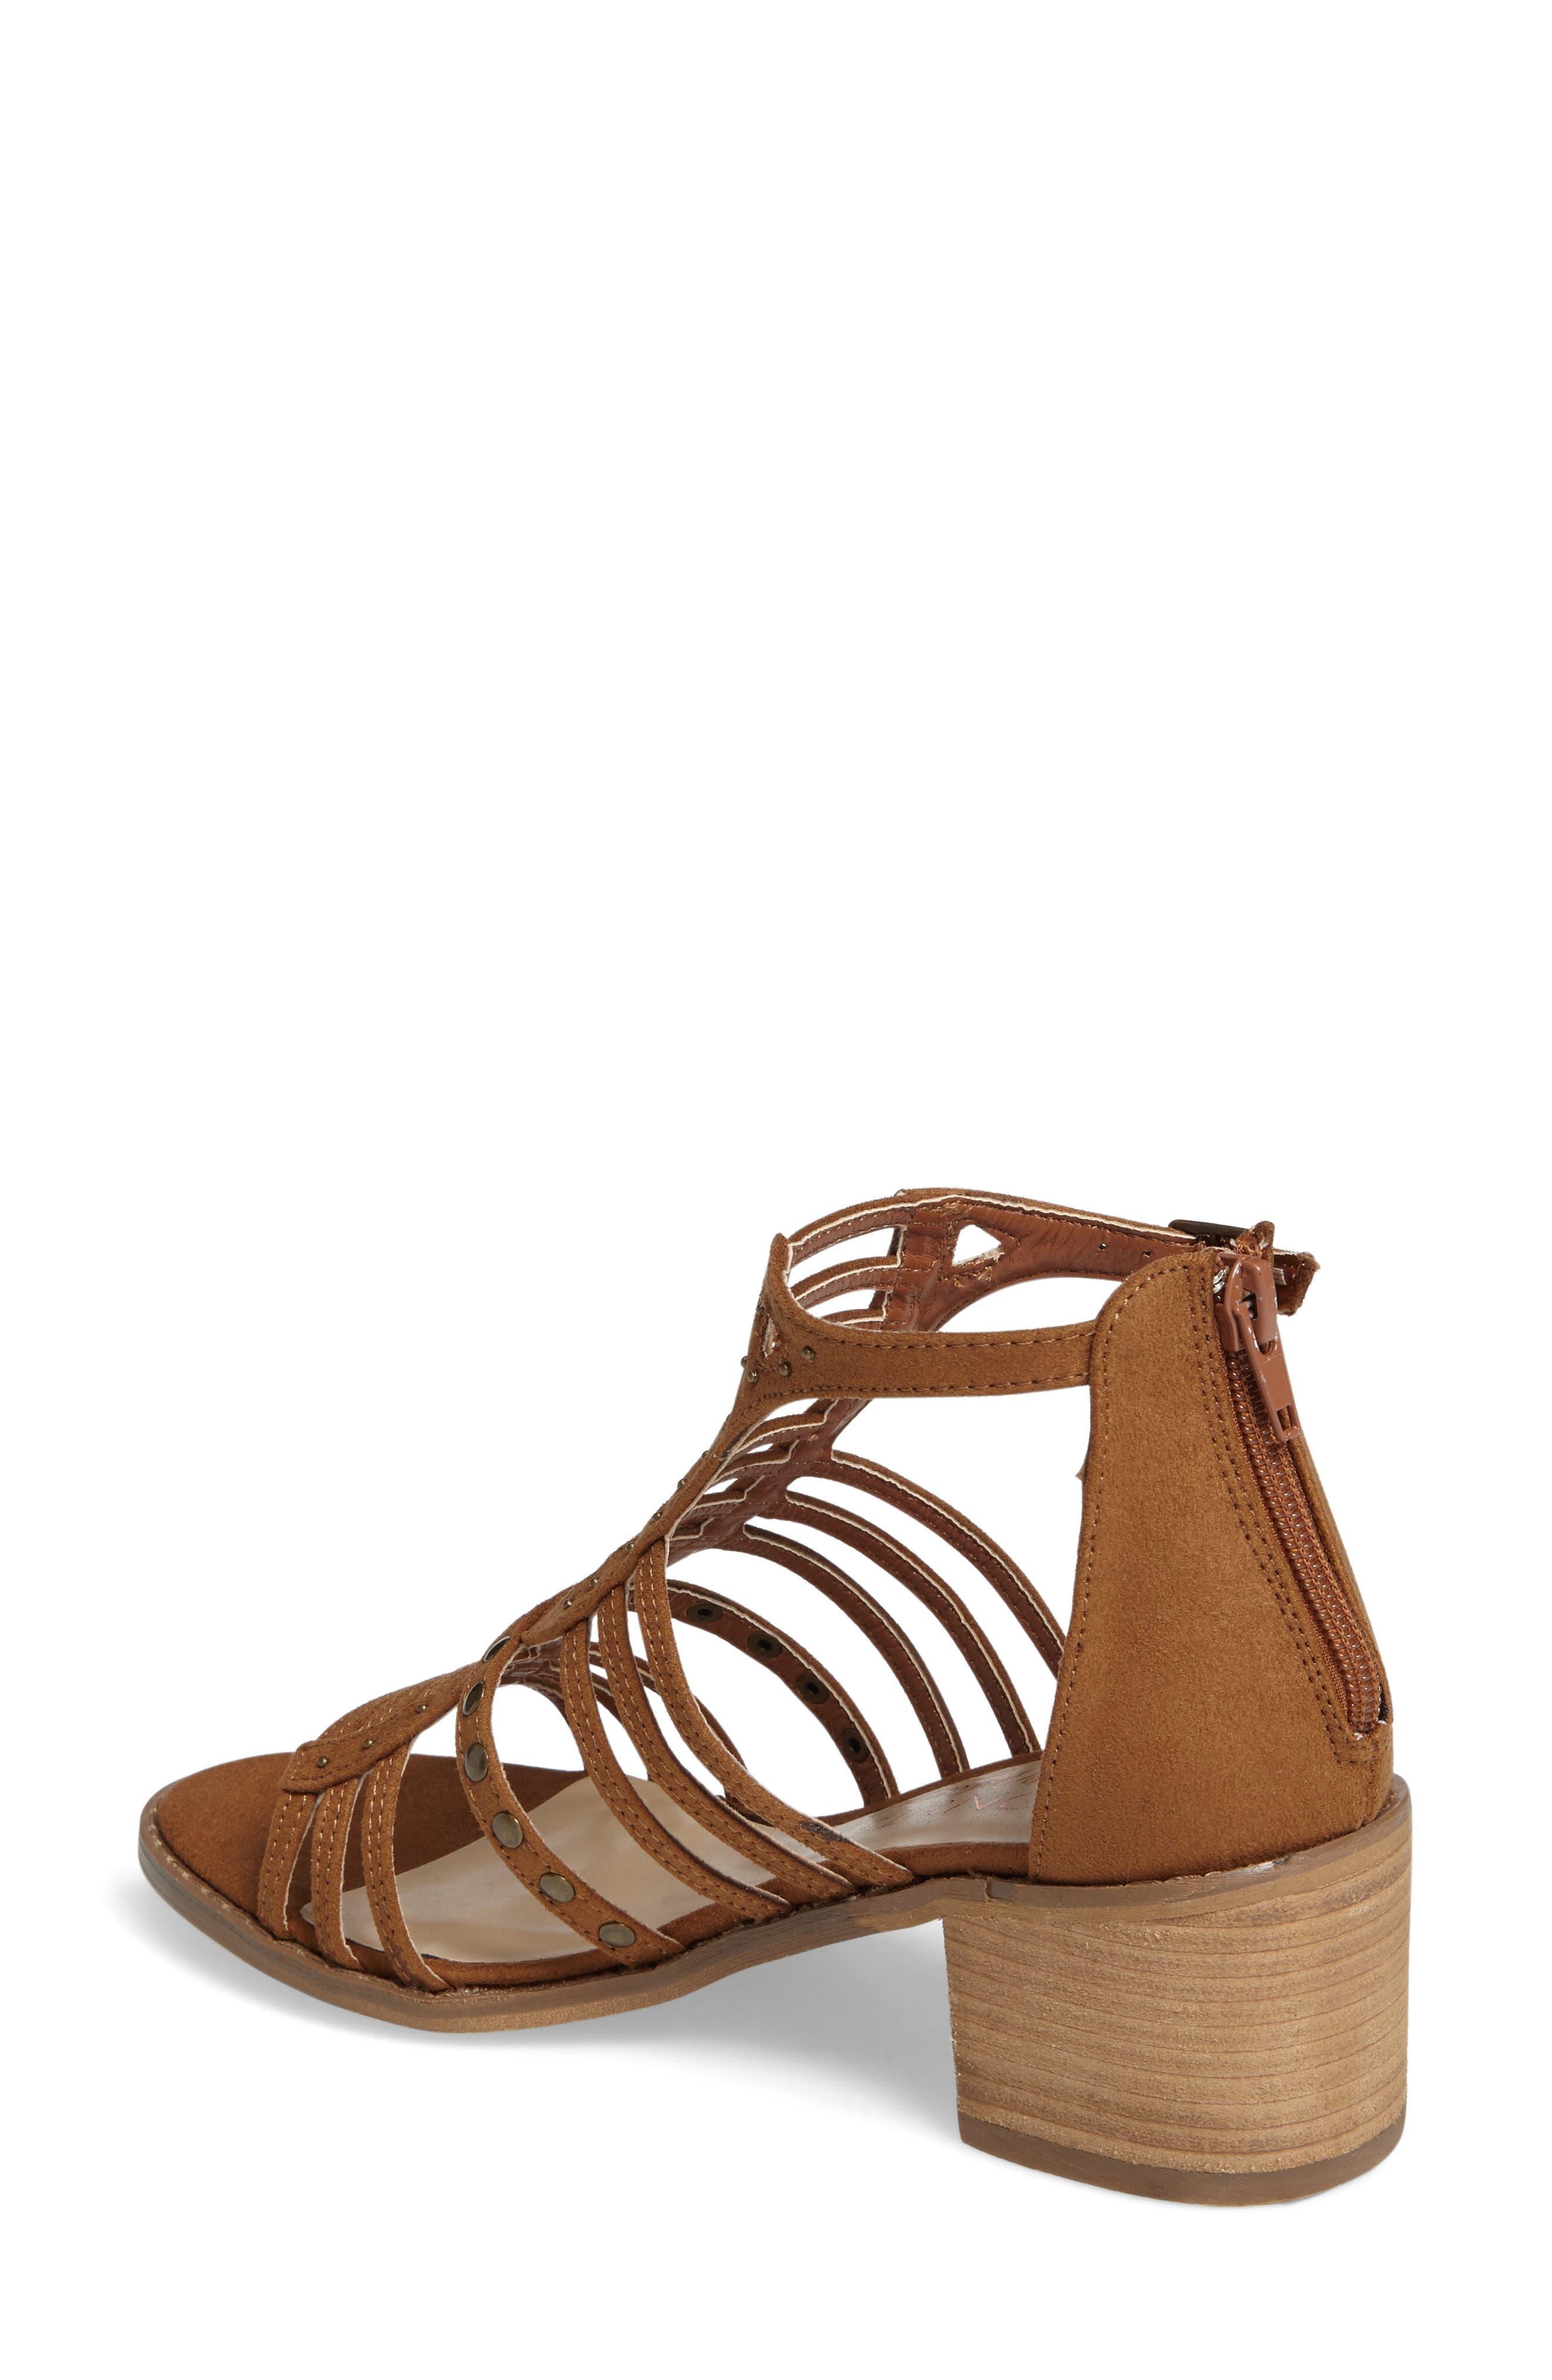 Matisse Essence Sandal,                             Alternate thumbnail 5, color,